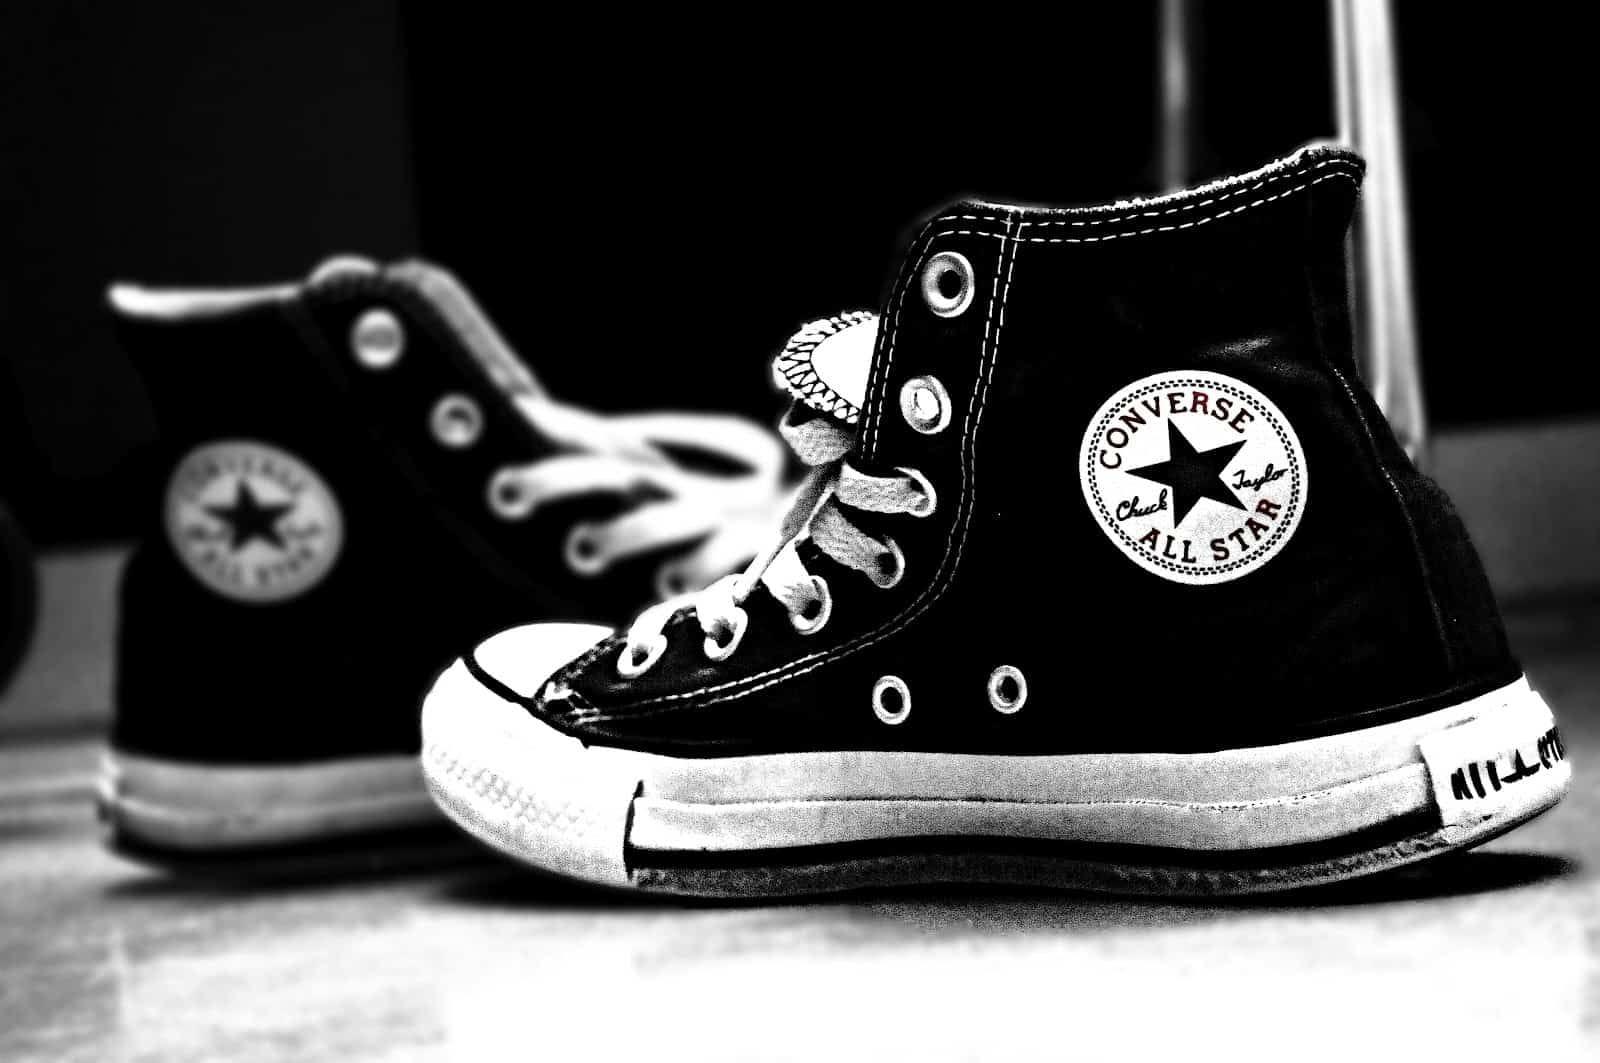 Star Converse L'homme Blog Altitude Les Taylor All Chuck Derrière xRYZw6qnA